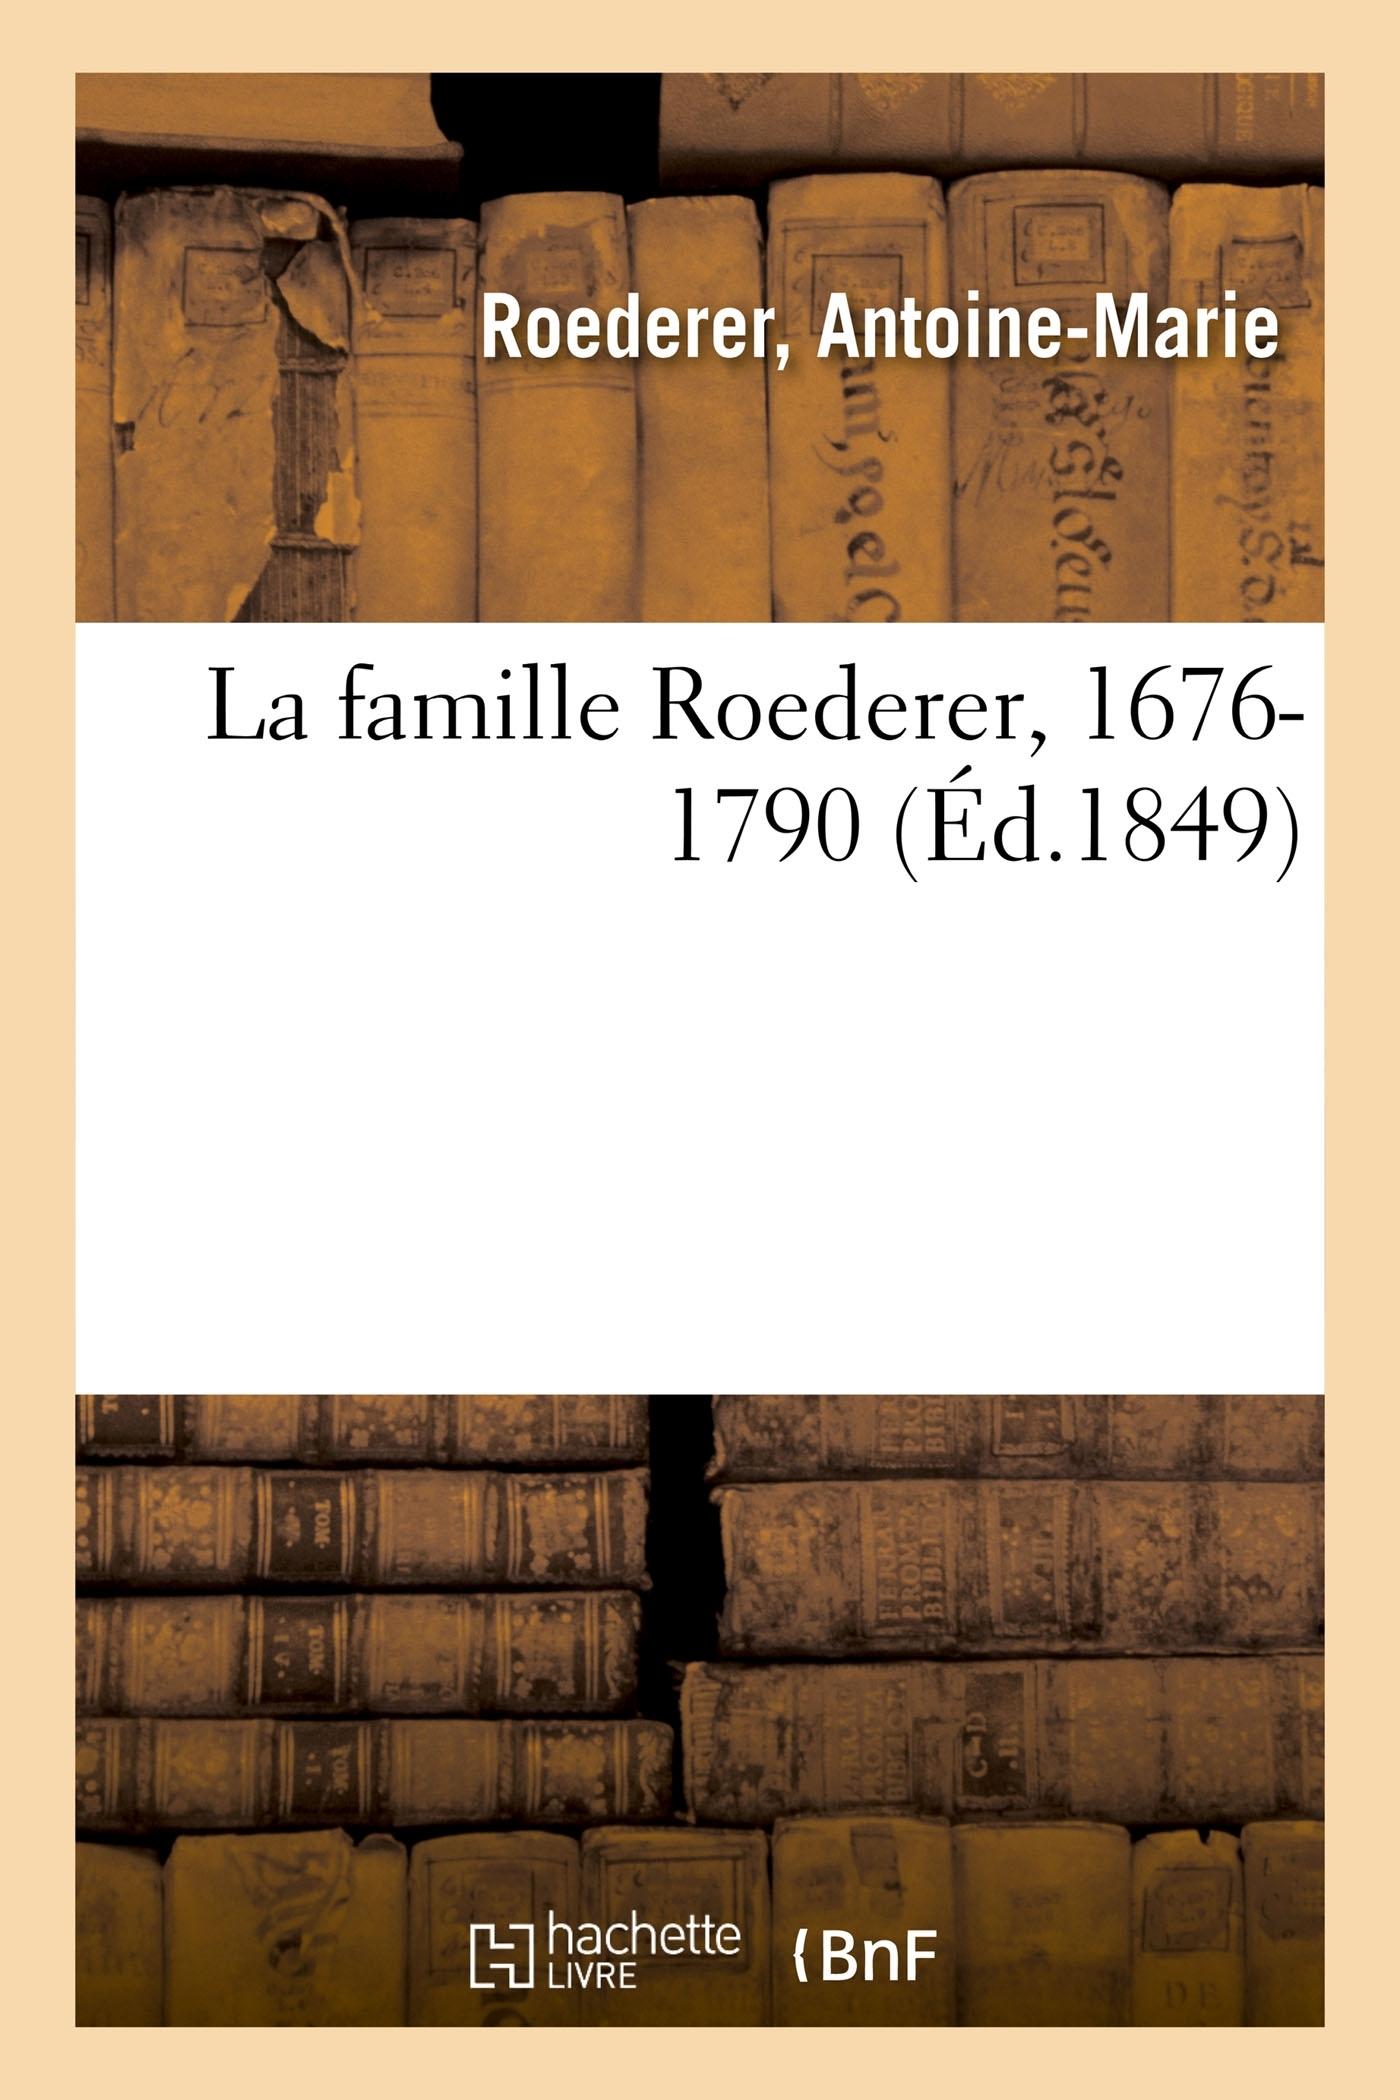 LA FAMILLE ROEDERER, 1676-1790